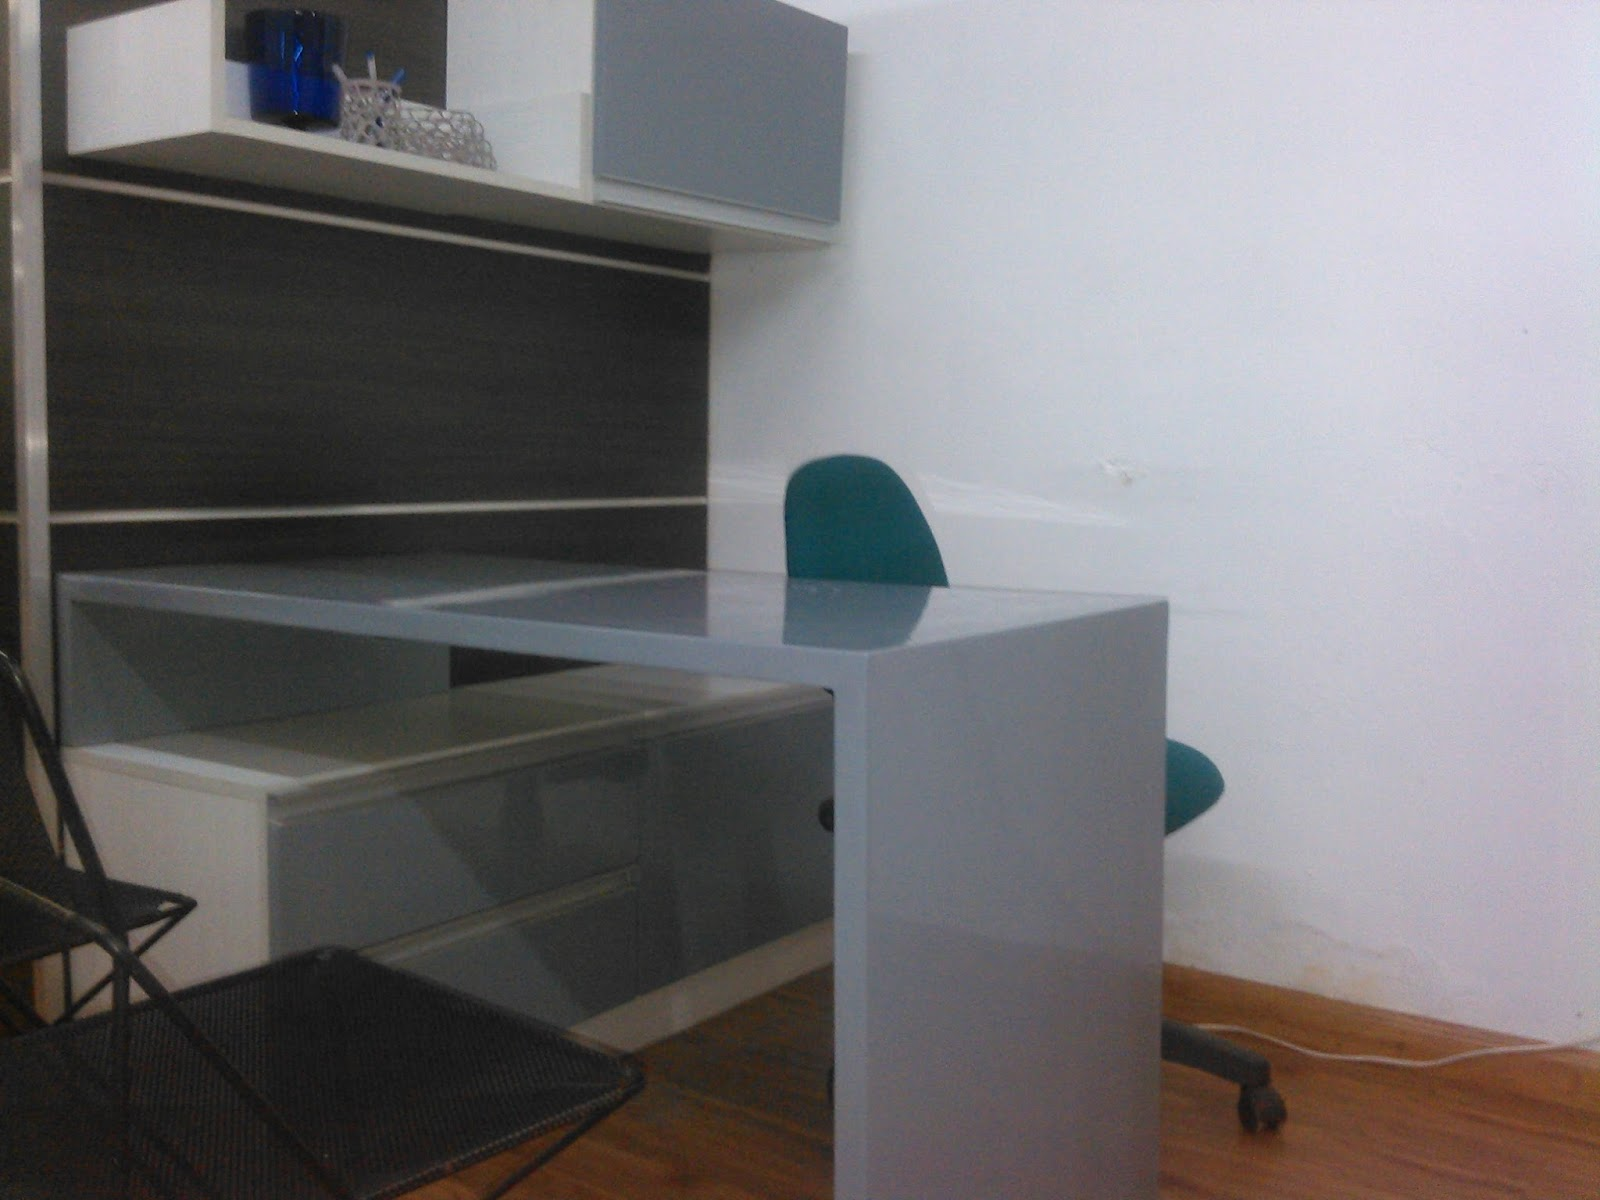 TP Fotos de Muebles para Oficina Comercial Moll en  - fotos de muebles de oficina